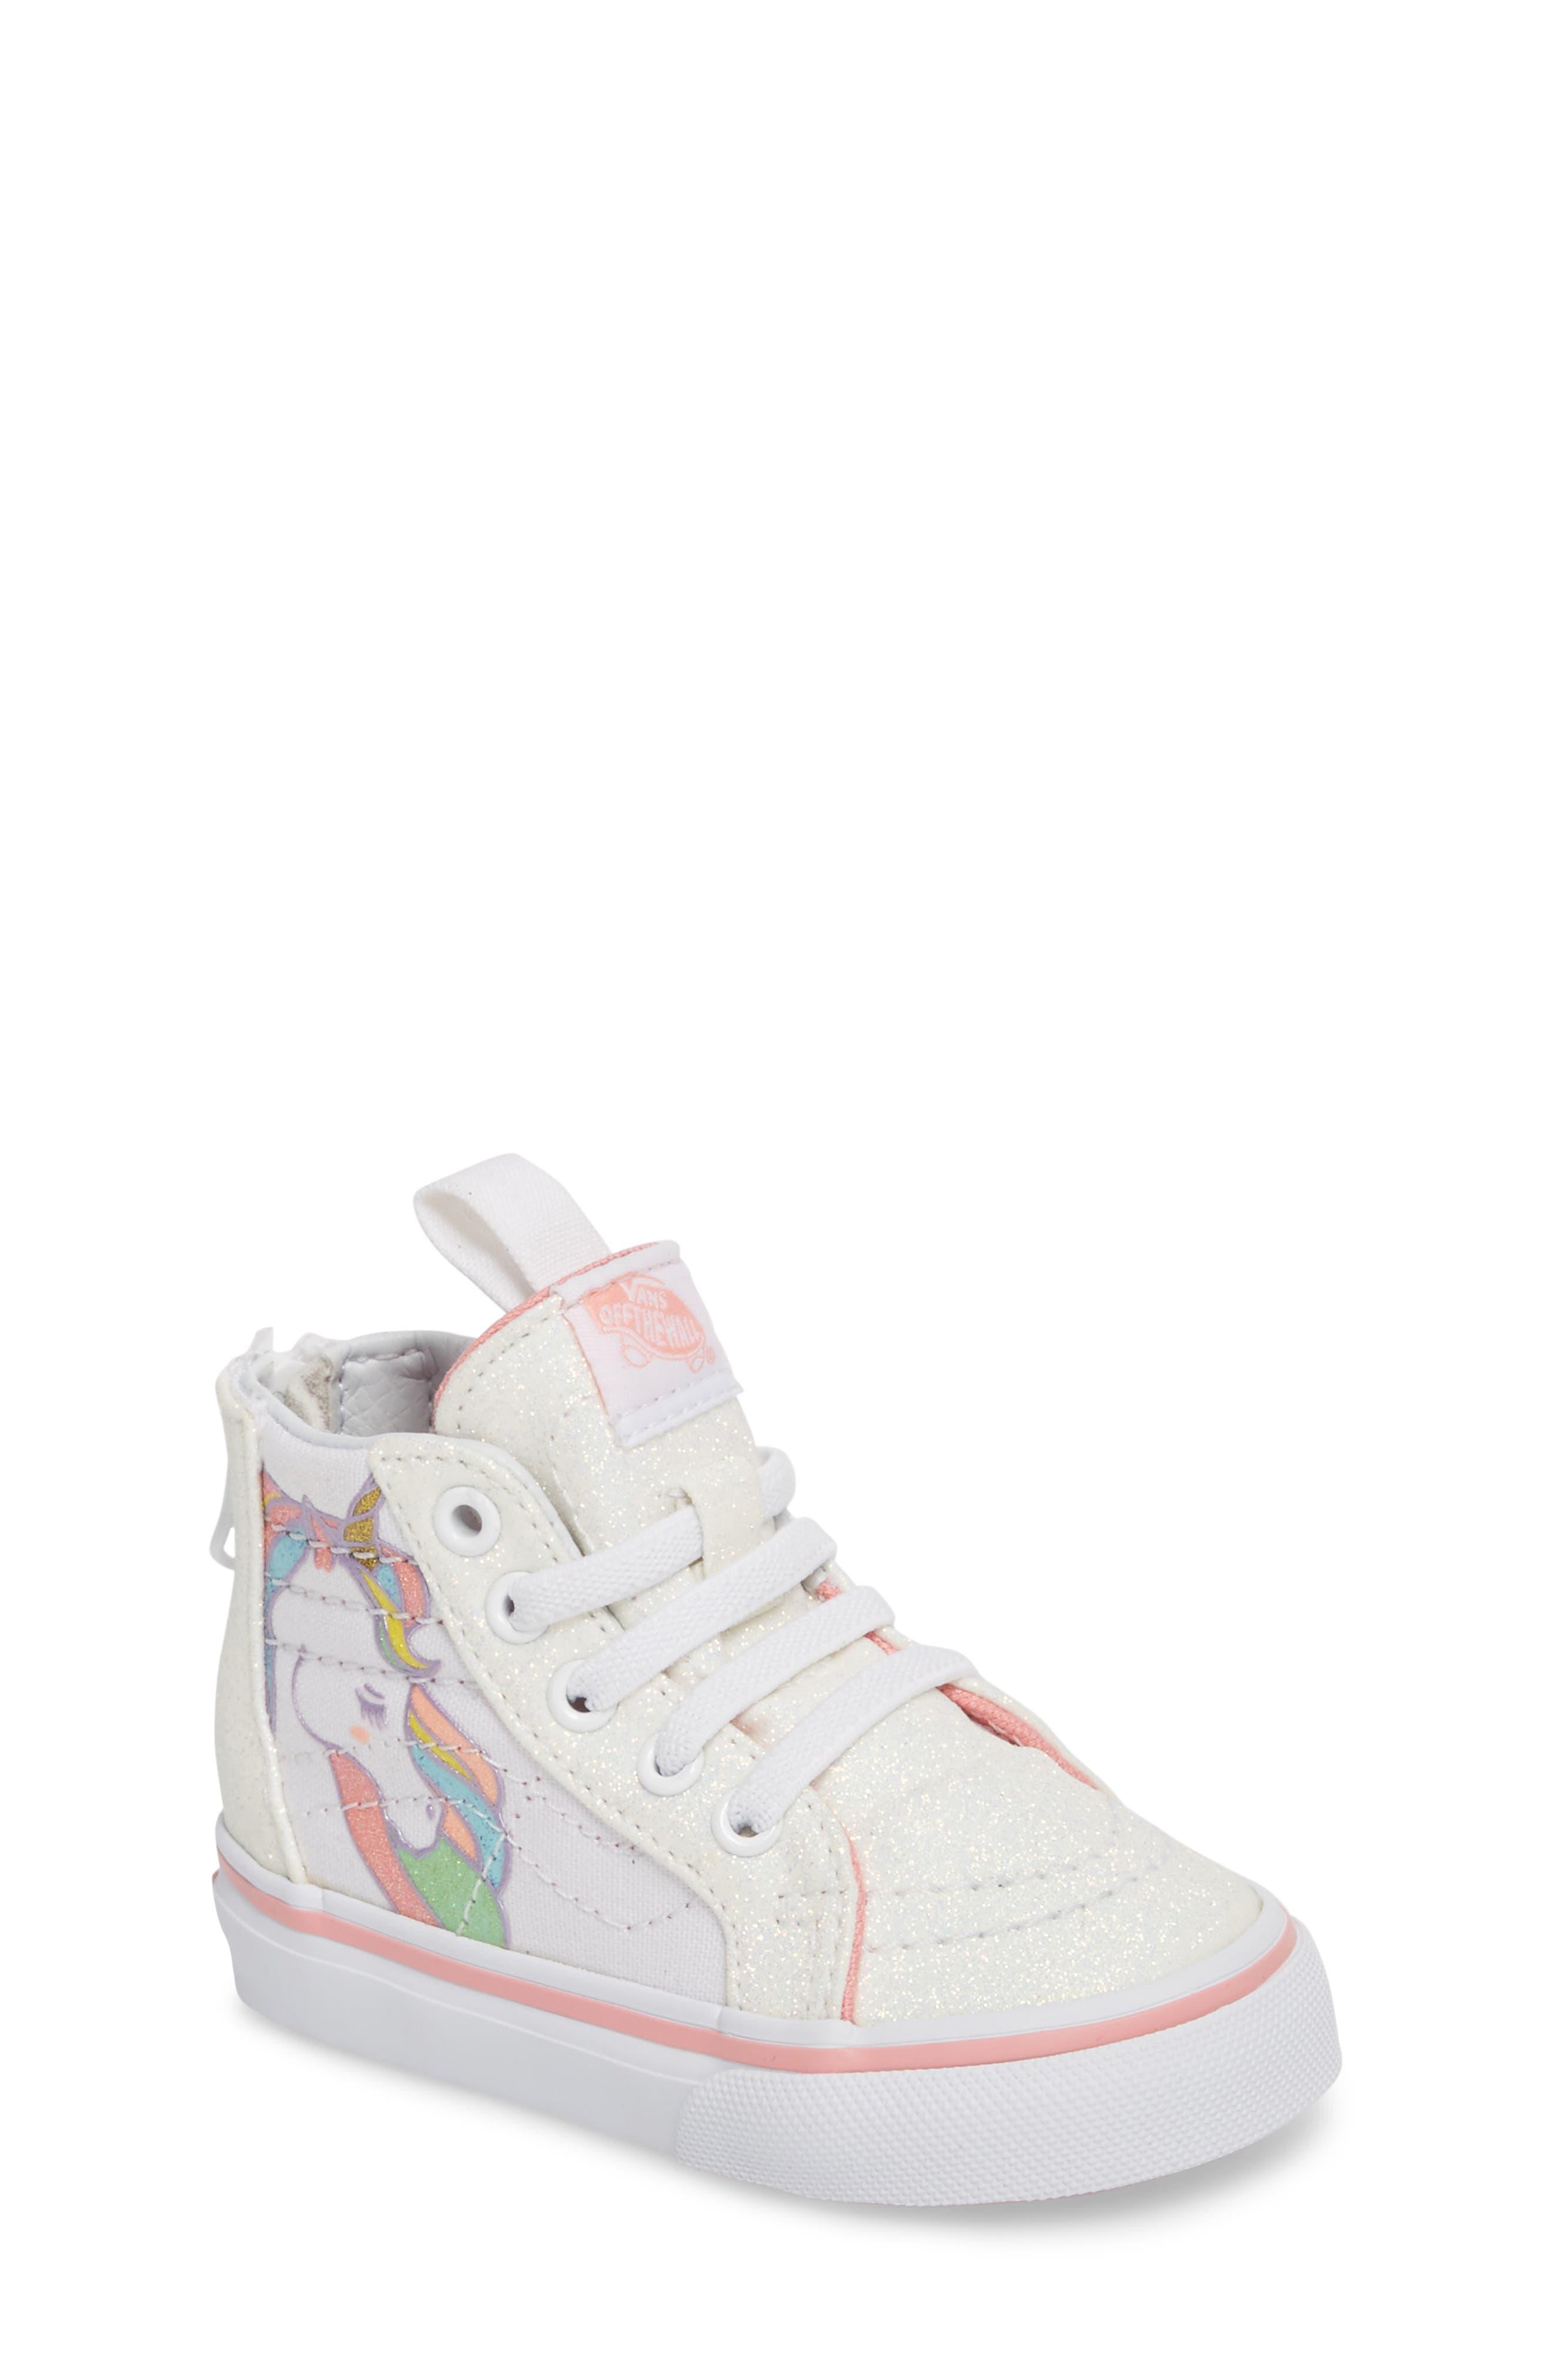 Alternate Image 1 Selected - Vans SK8-Hi Zip Glitter Unicorn Sneaker (Baby, Walker & Toddler)